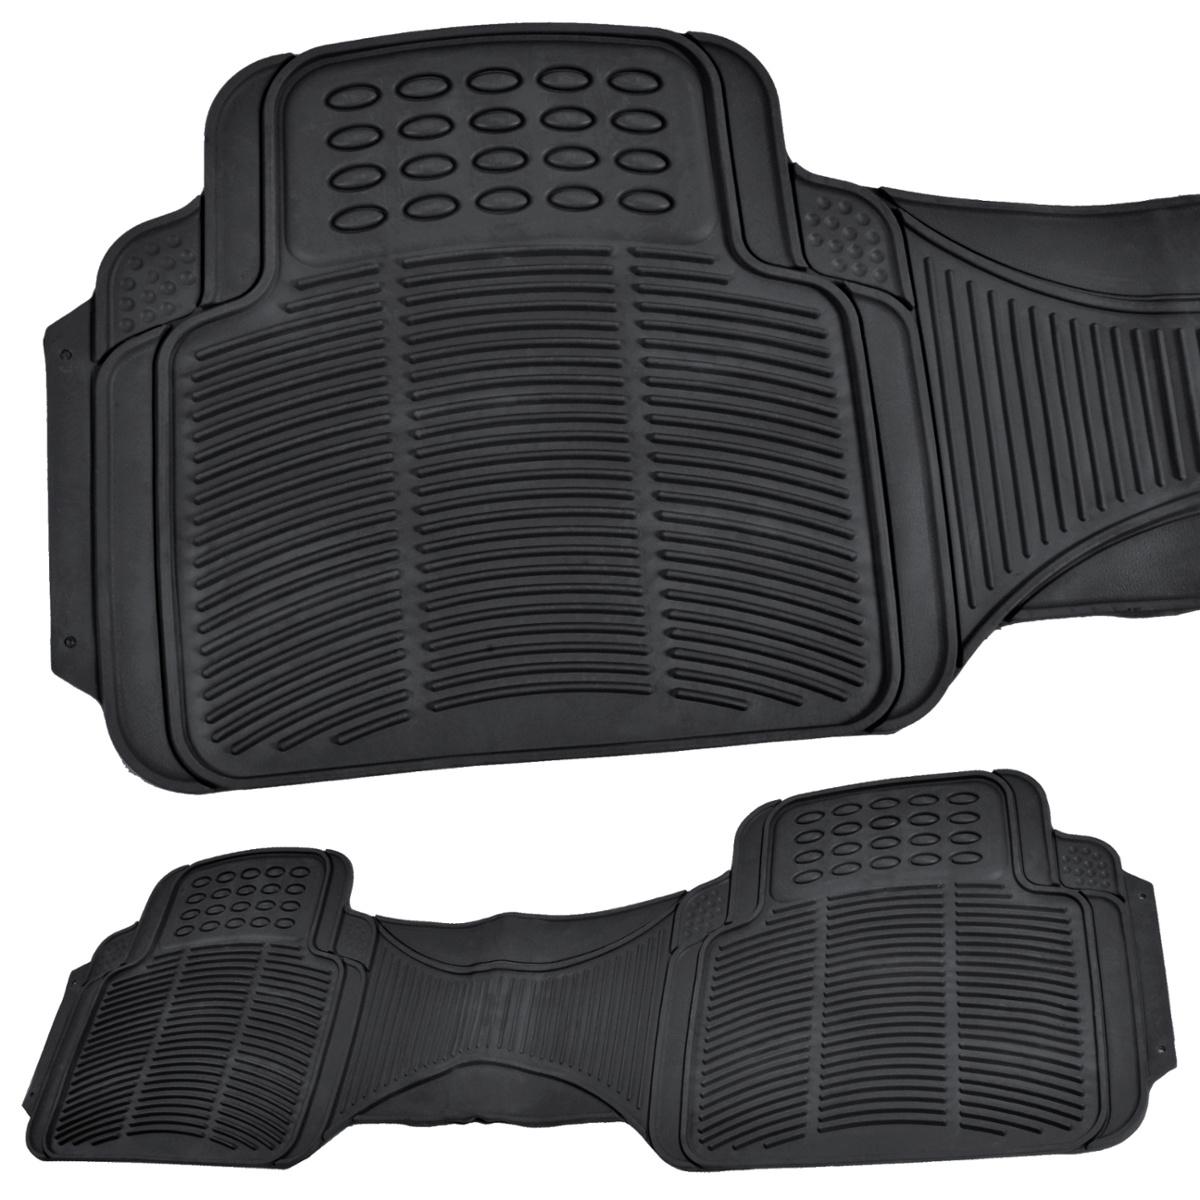 Vehicle Floor Mats : Car floor mats for all weather rubber heavy duty